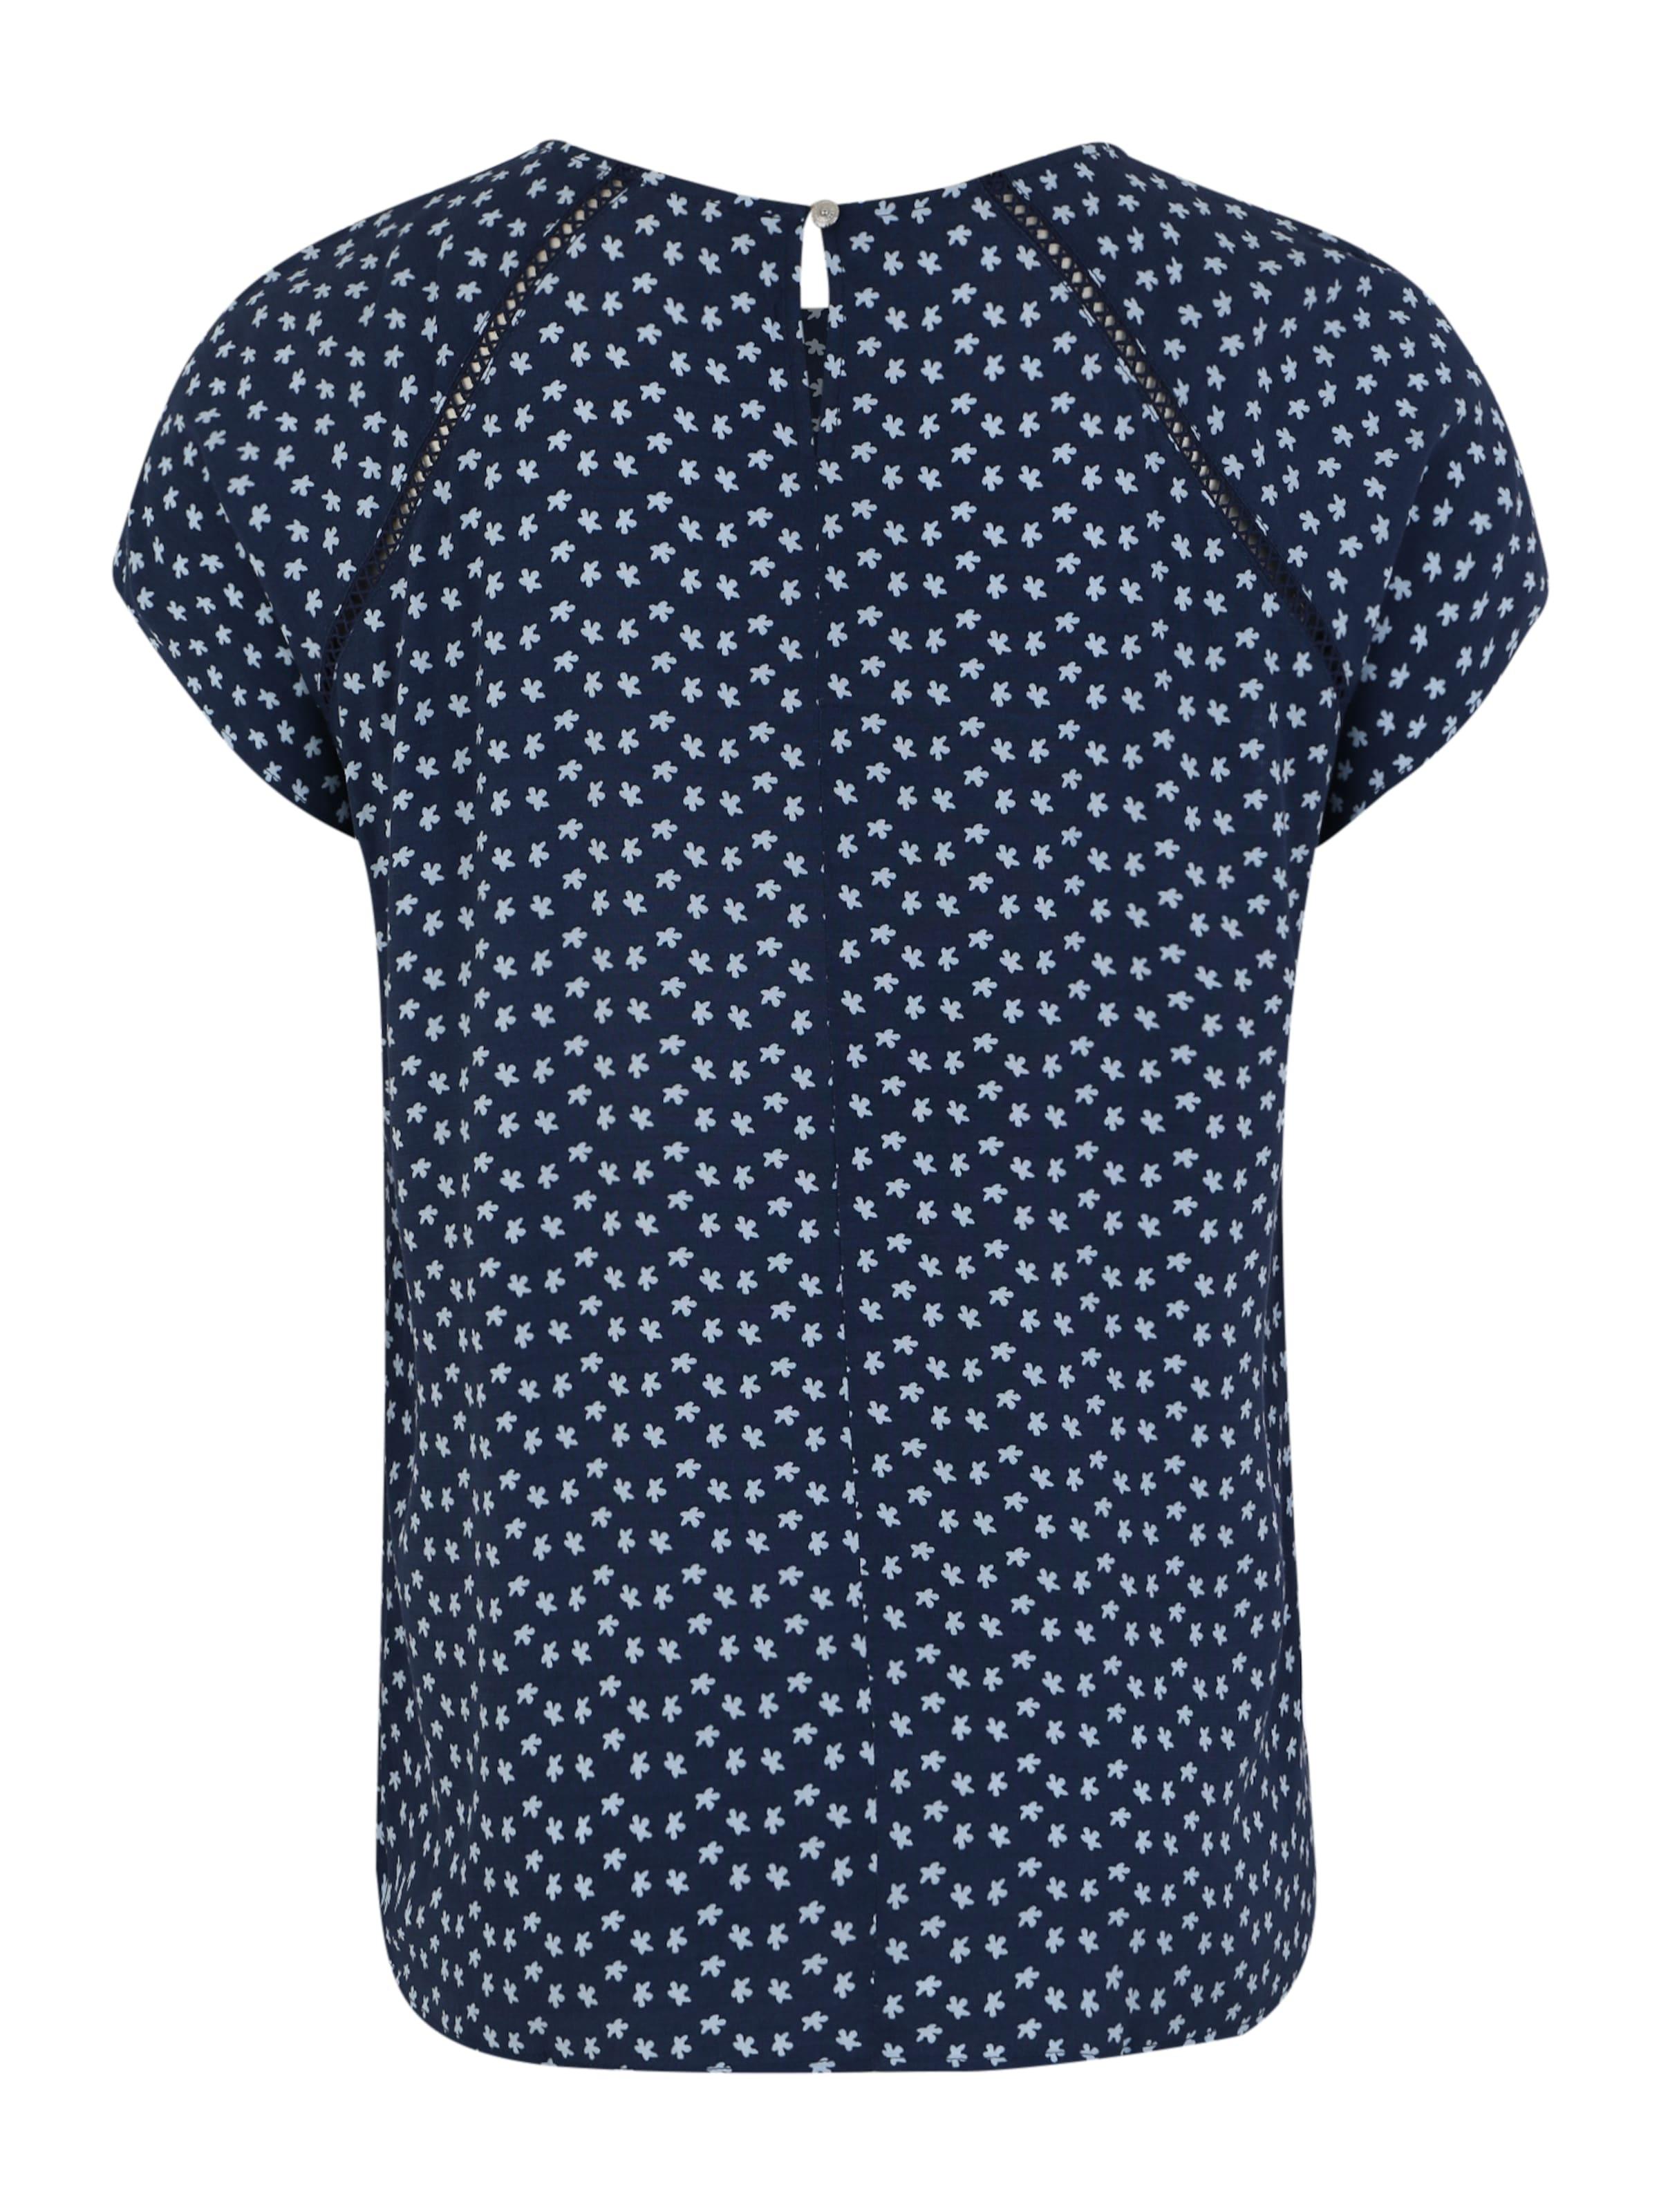 T shirt En Popken Bleu ClairFoncé Ulla 2EDHYIW9